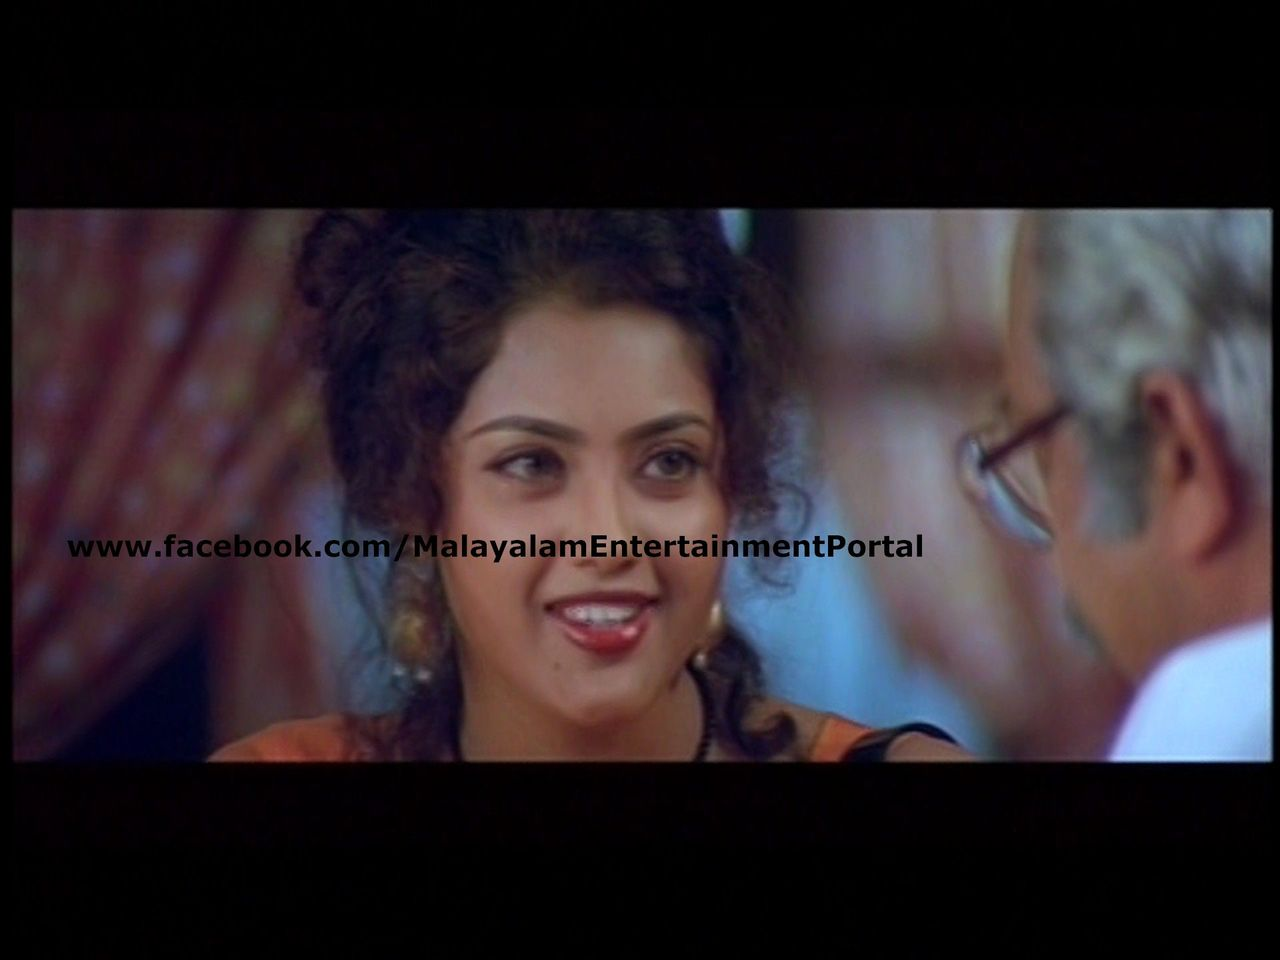 Rakshasarajavu DVD Screenshots (Saina) Bscap0010